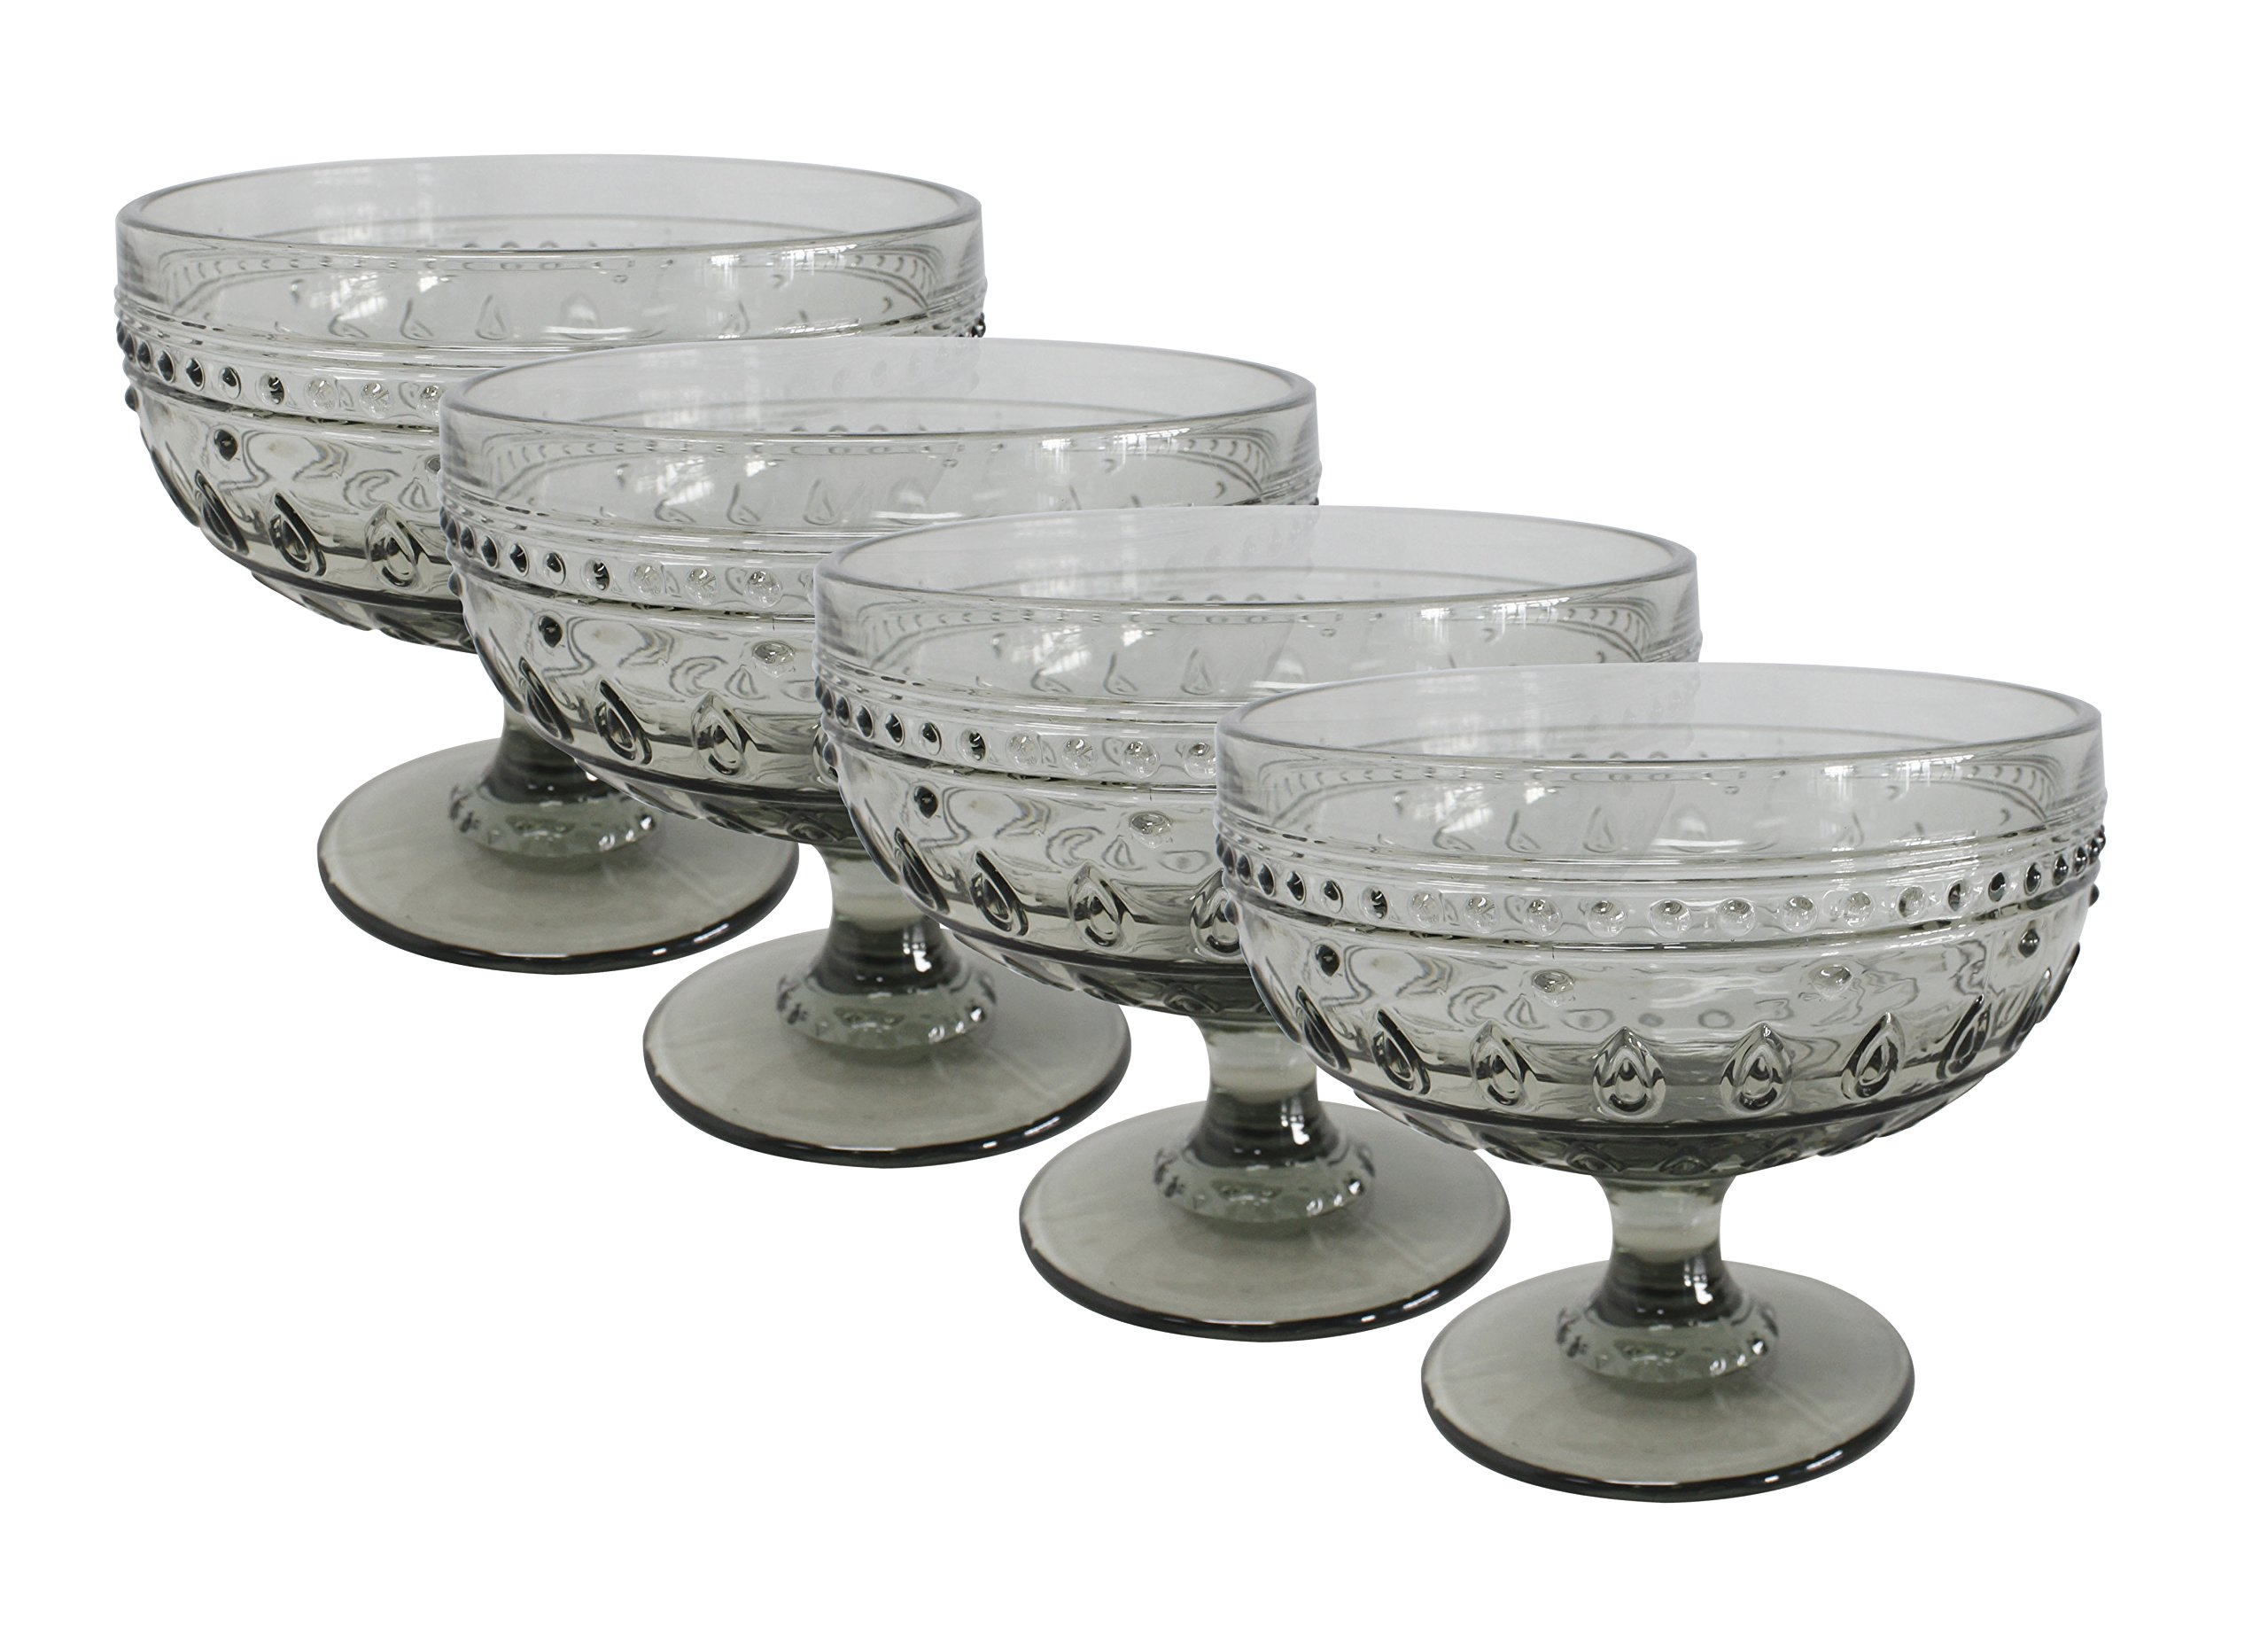 Euro Ceramica Fez Glassware Collection Footed Compote/Dessert Bowl Glasses, 13oz, Set of 4, Gray